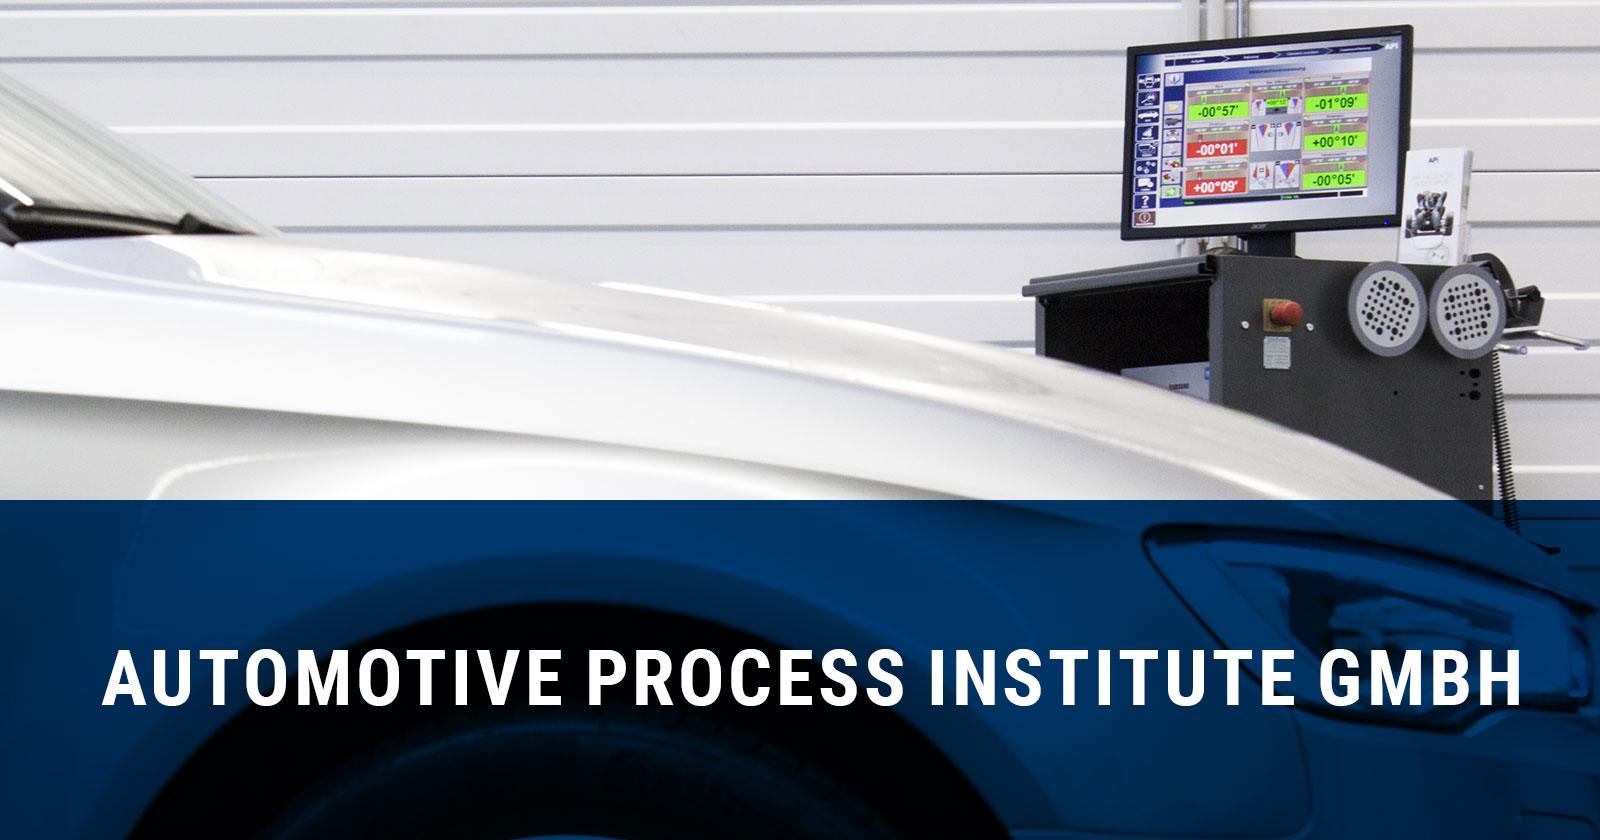 APi - Automotive Process Institute GmbH